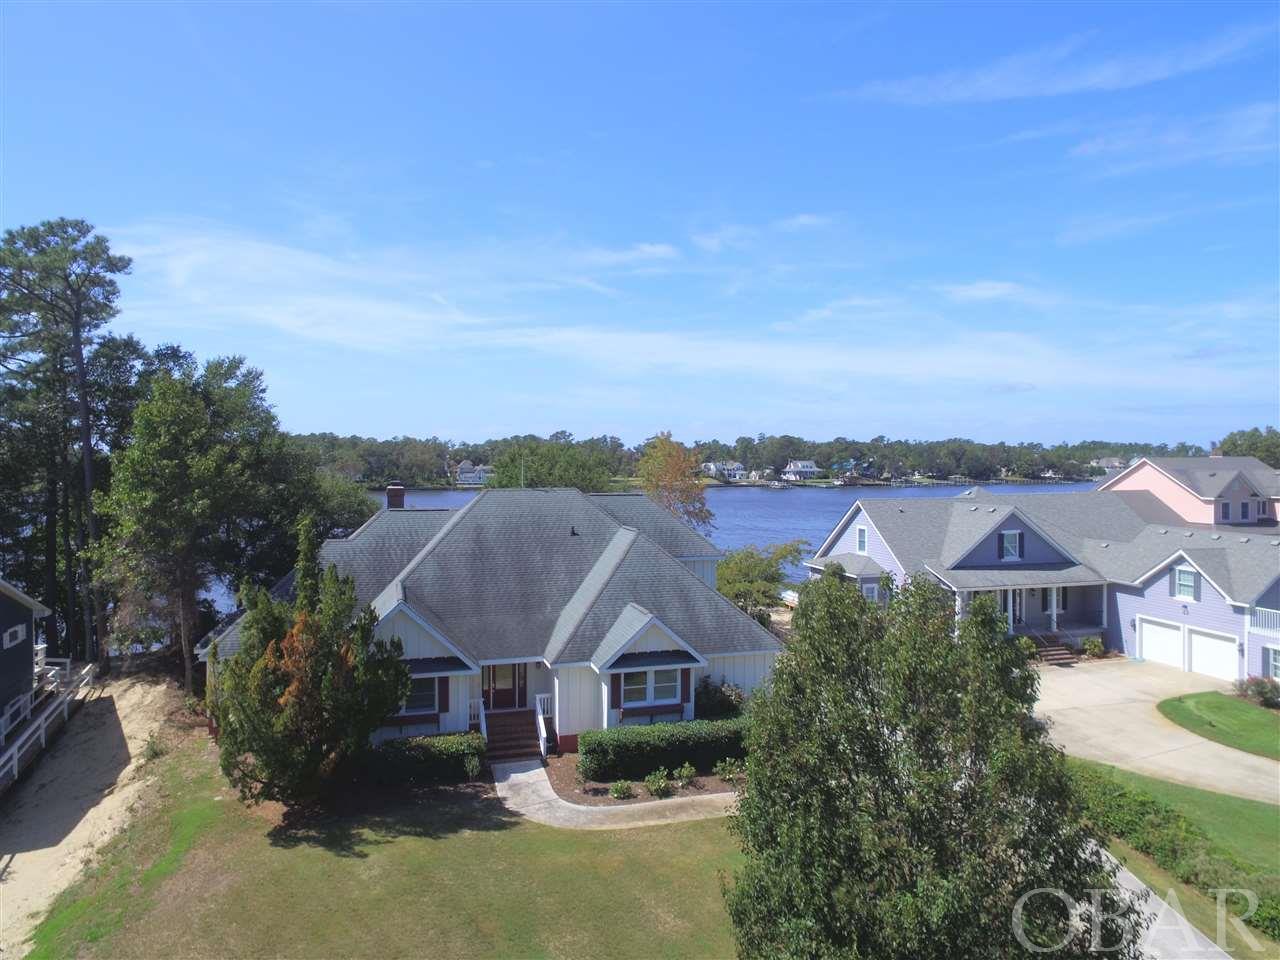 129 Tall Pine Lane Lot 4, Southern Shores, NC 27949